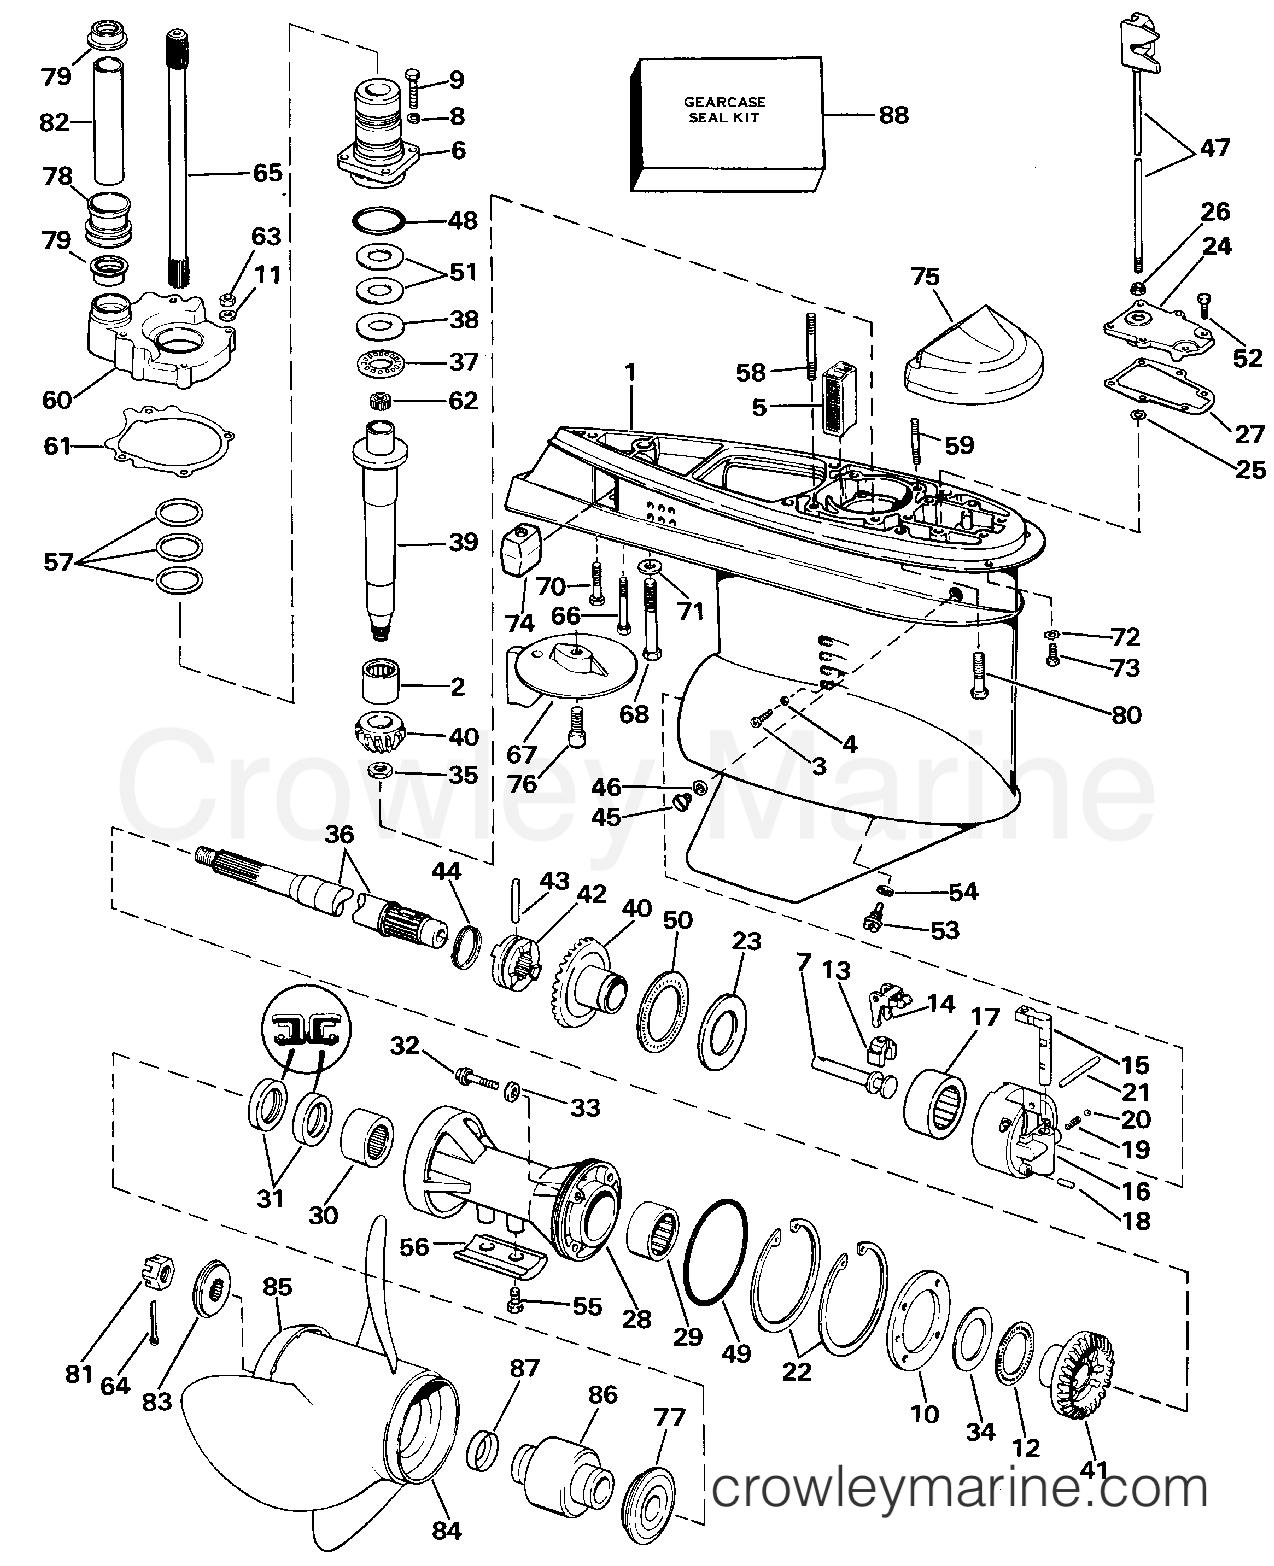 Omc Water Pump Diagram Wiring Harness Adapter Lower Gearcase Stern Drive Amarj Crowley Marine Crowleymarine Com Sterndrive Parts